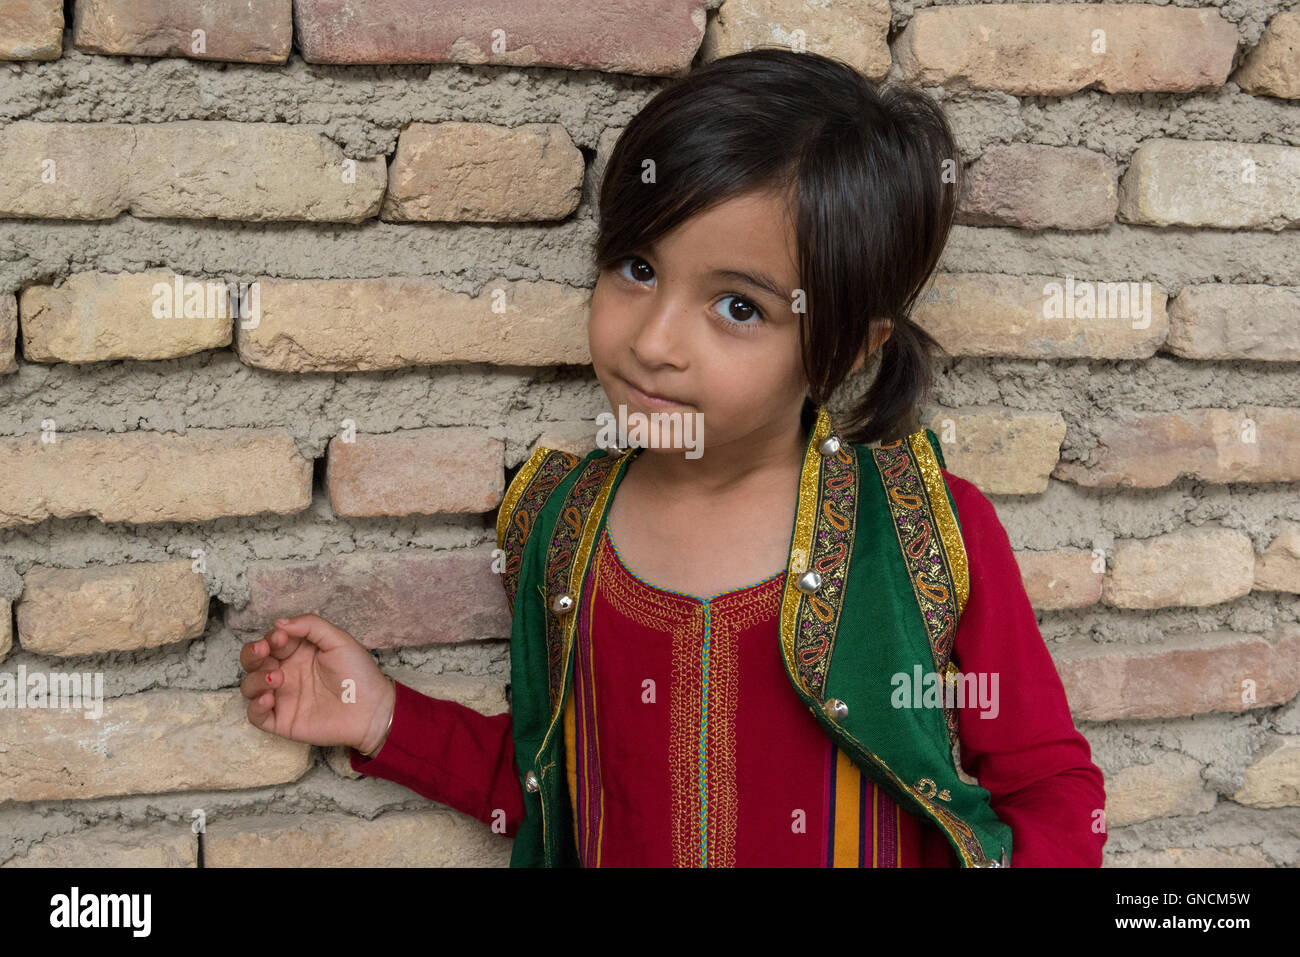 Bandar Torkaman, Turkmen Wedding, Girl In Front Of Brick Wall At Lunch Venue - Stock Image